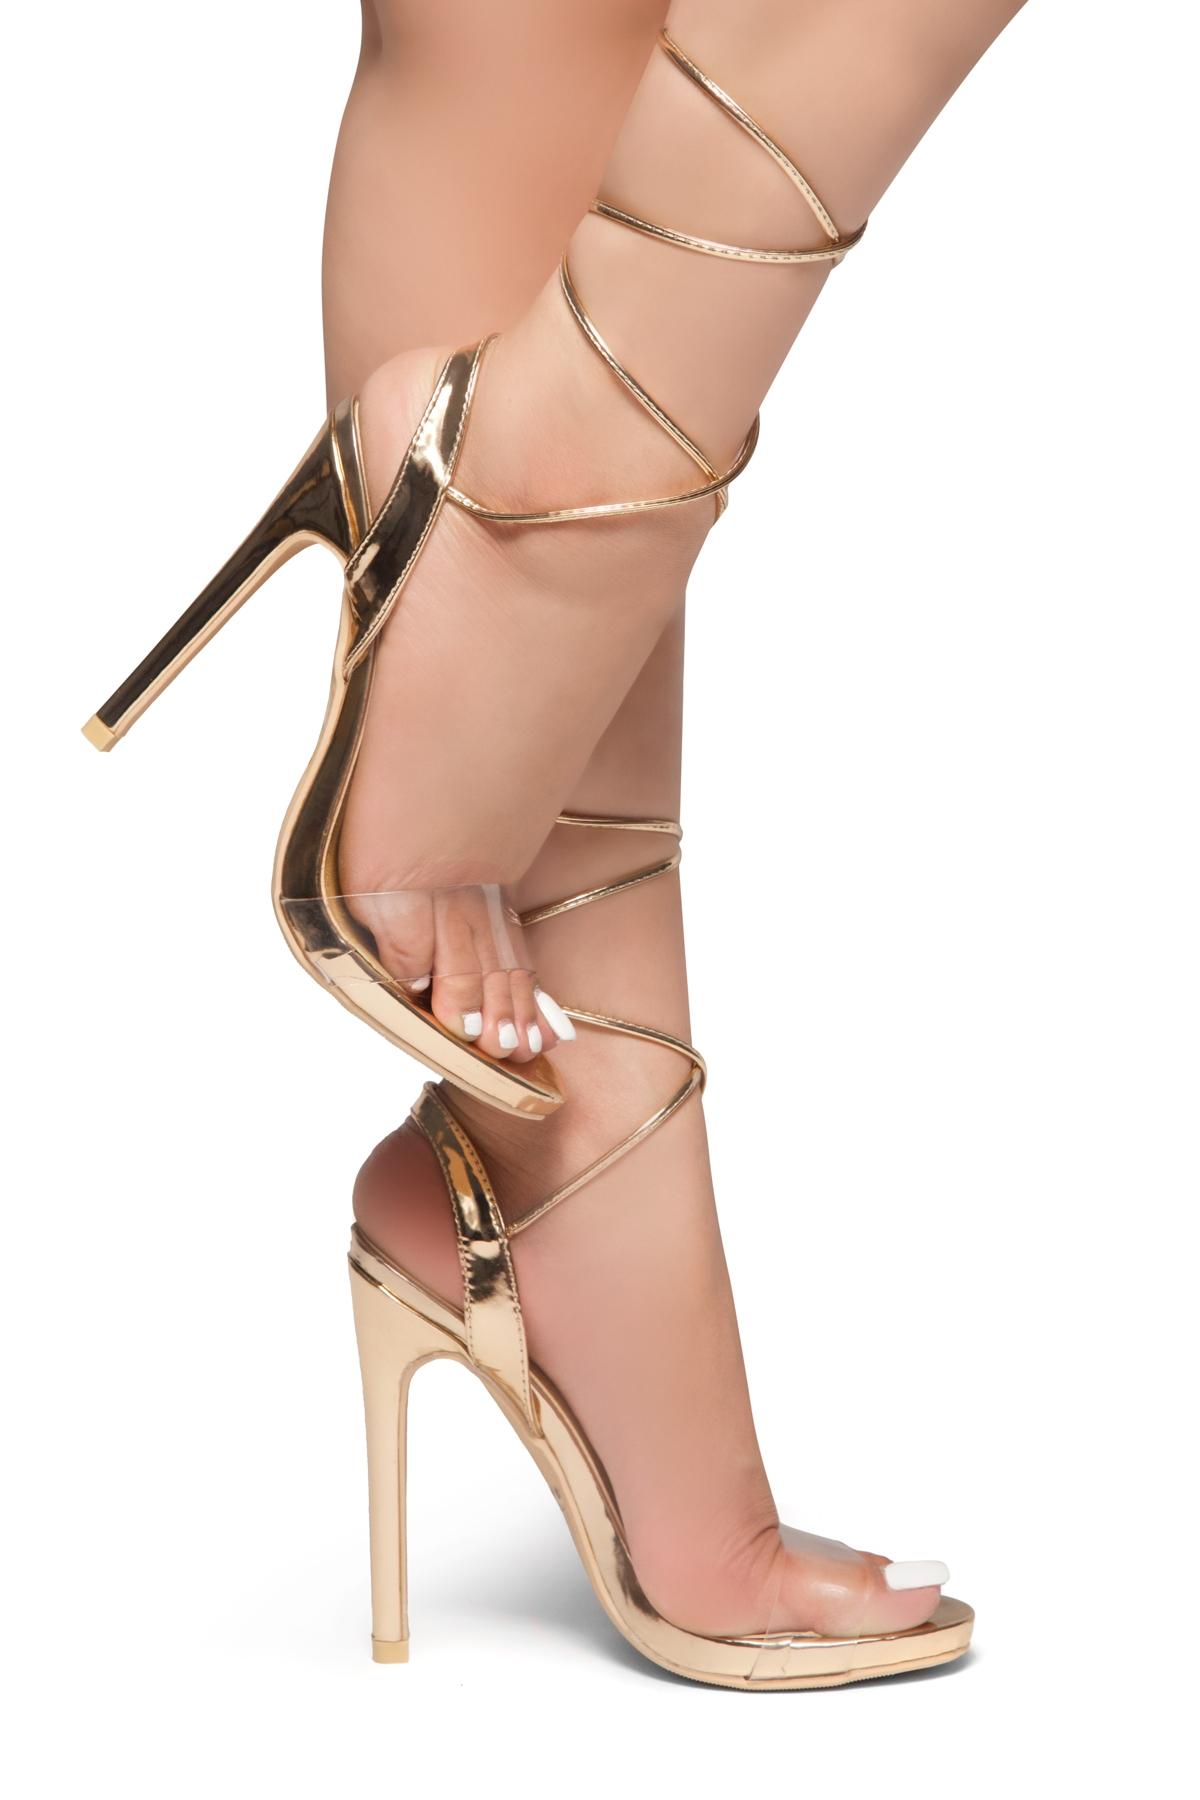 4899584b5362 HerStyle KINZA-Stiletto heel